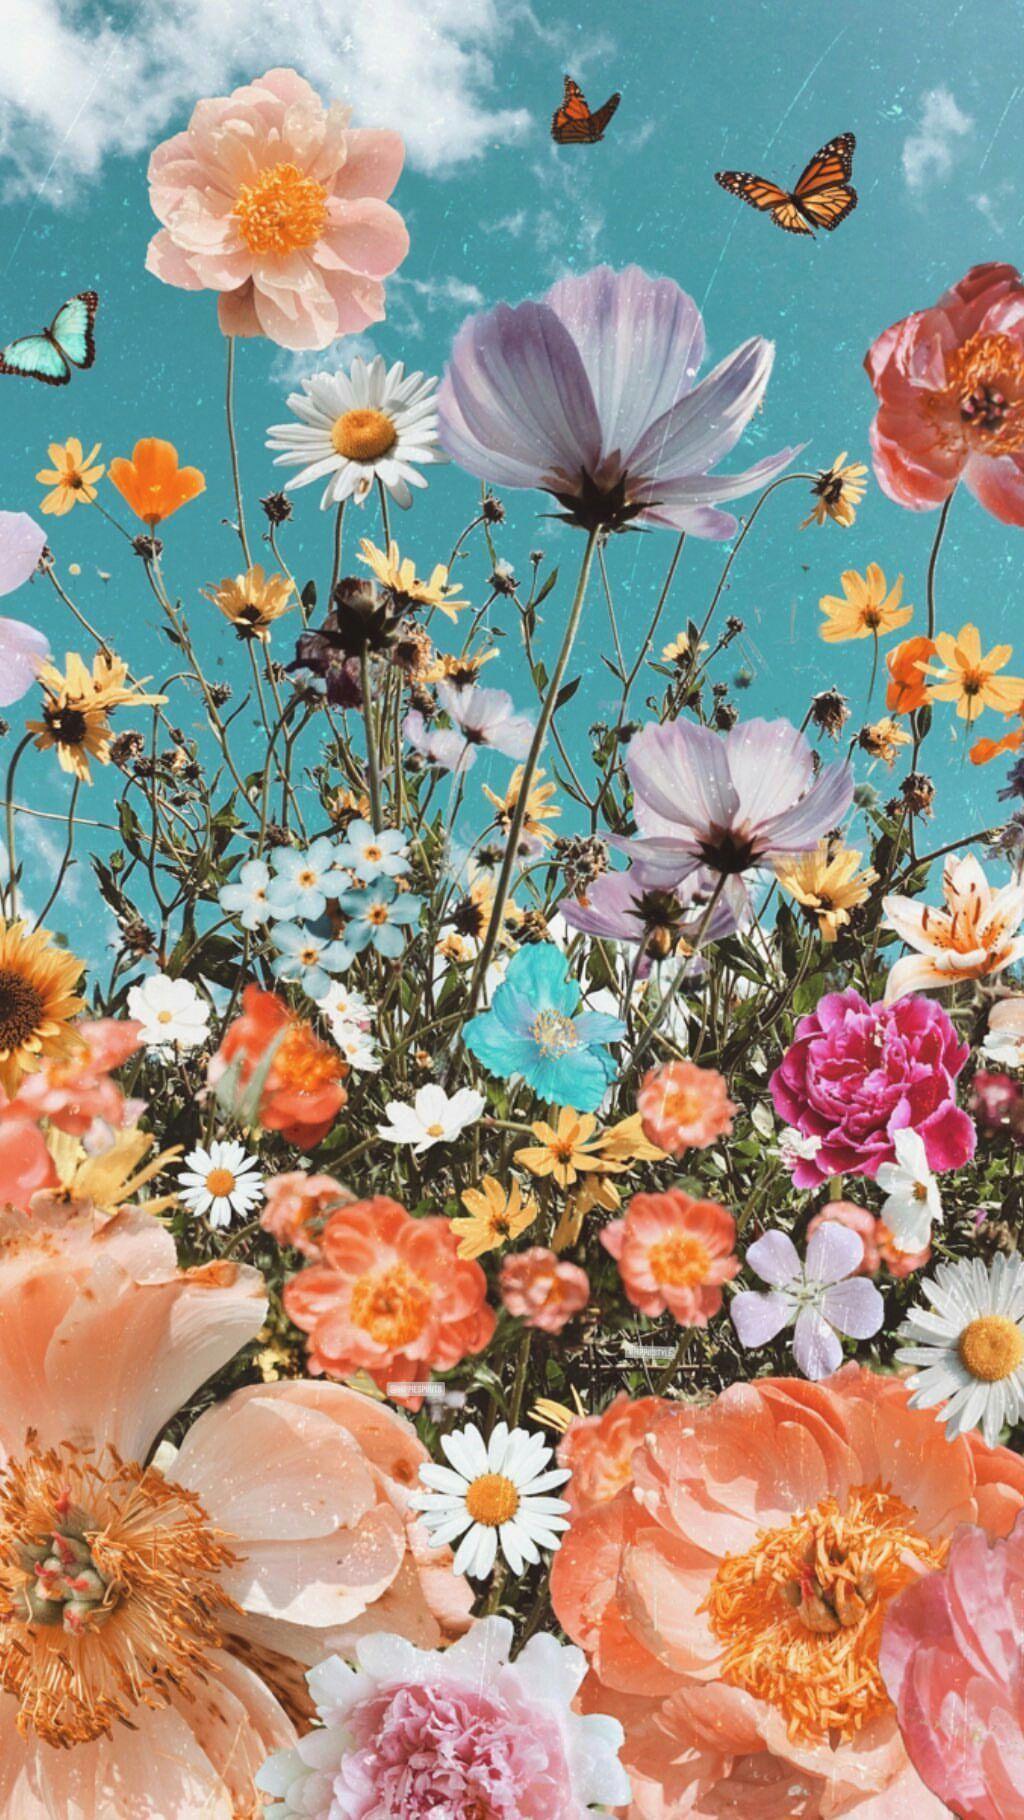 #flower #flowers #plants #botanical #floral #beautiful #background #beautiful #botanical #floral #flower #flowers #nature #plants #travel #wallpaper #wallpaper background #backgroundsforphones